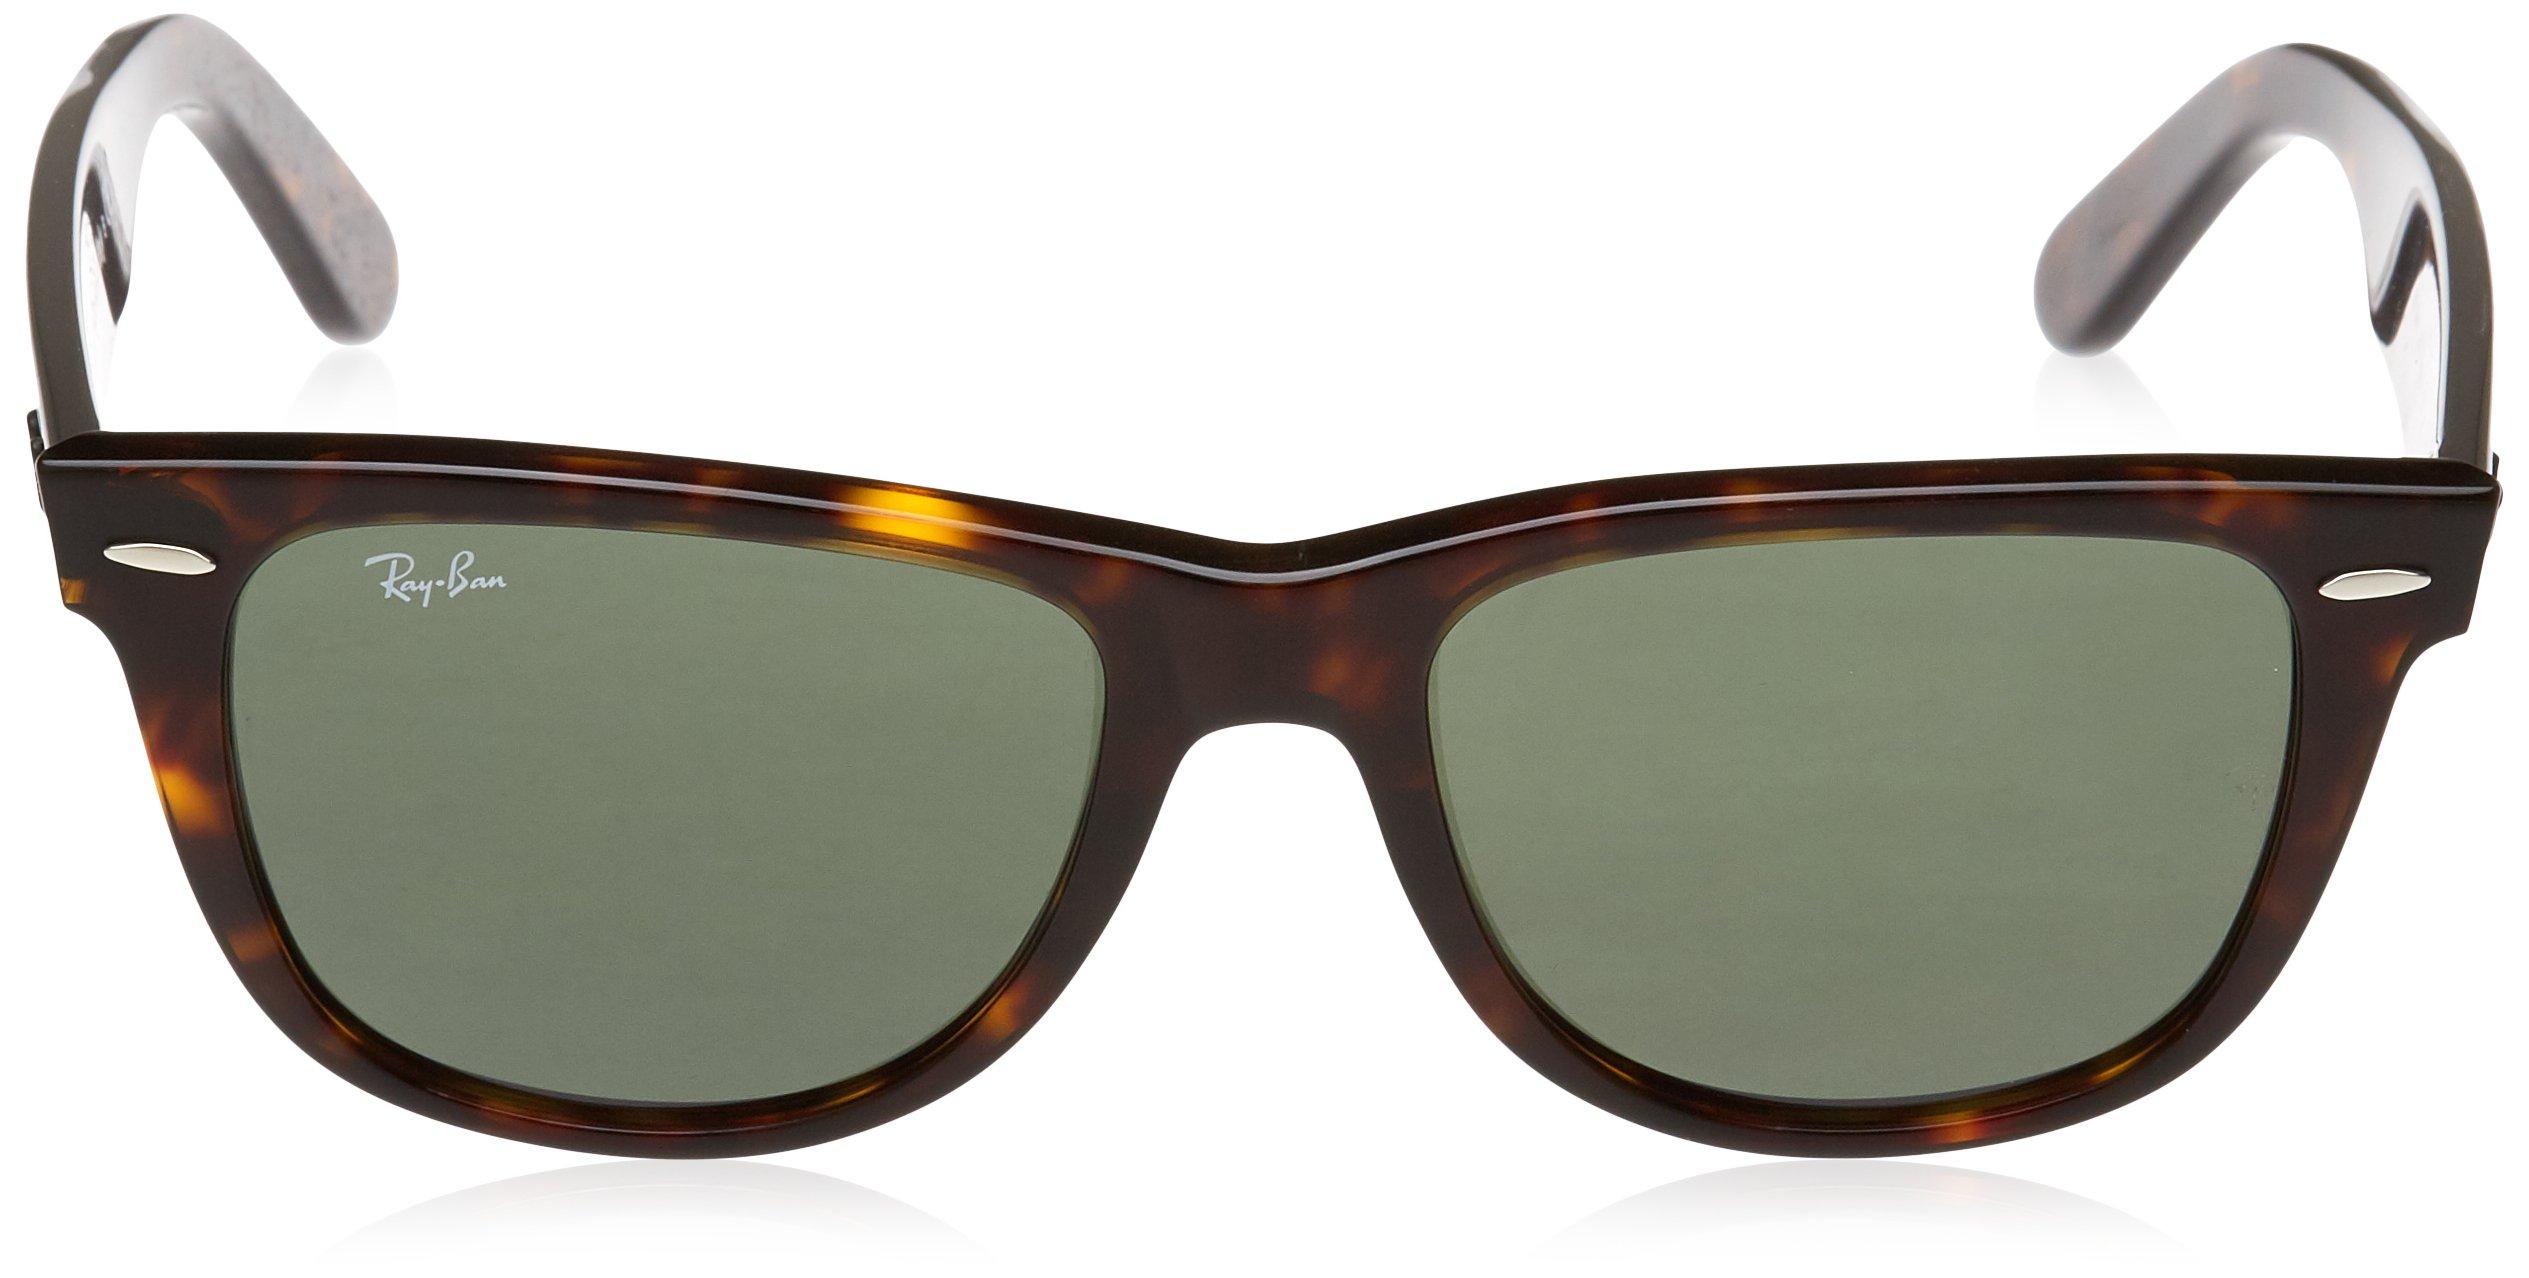 Ray-Ban, RB2140 Original Wayfarer Sunglasses, Unisex Ray-Ban Glasses, 100% UV Protection, Non-Polarized, Reduce Eye Strain, Lightweight Acetate Frame, Prescription-Ready Lenses, 54 mm Frame by Ray-Ban (Image #2)